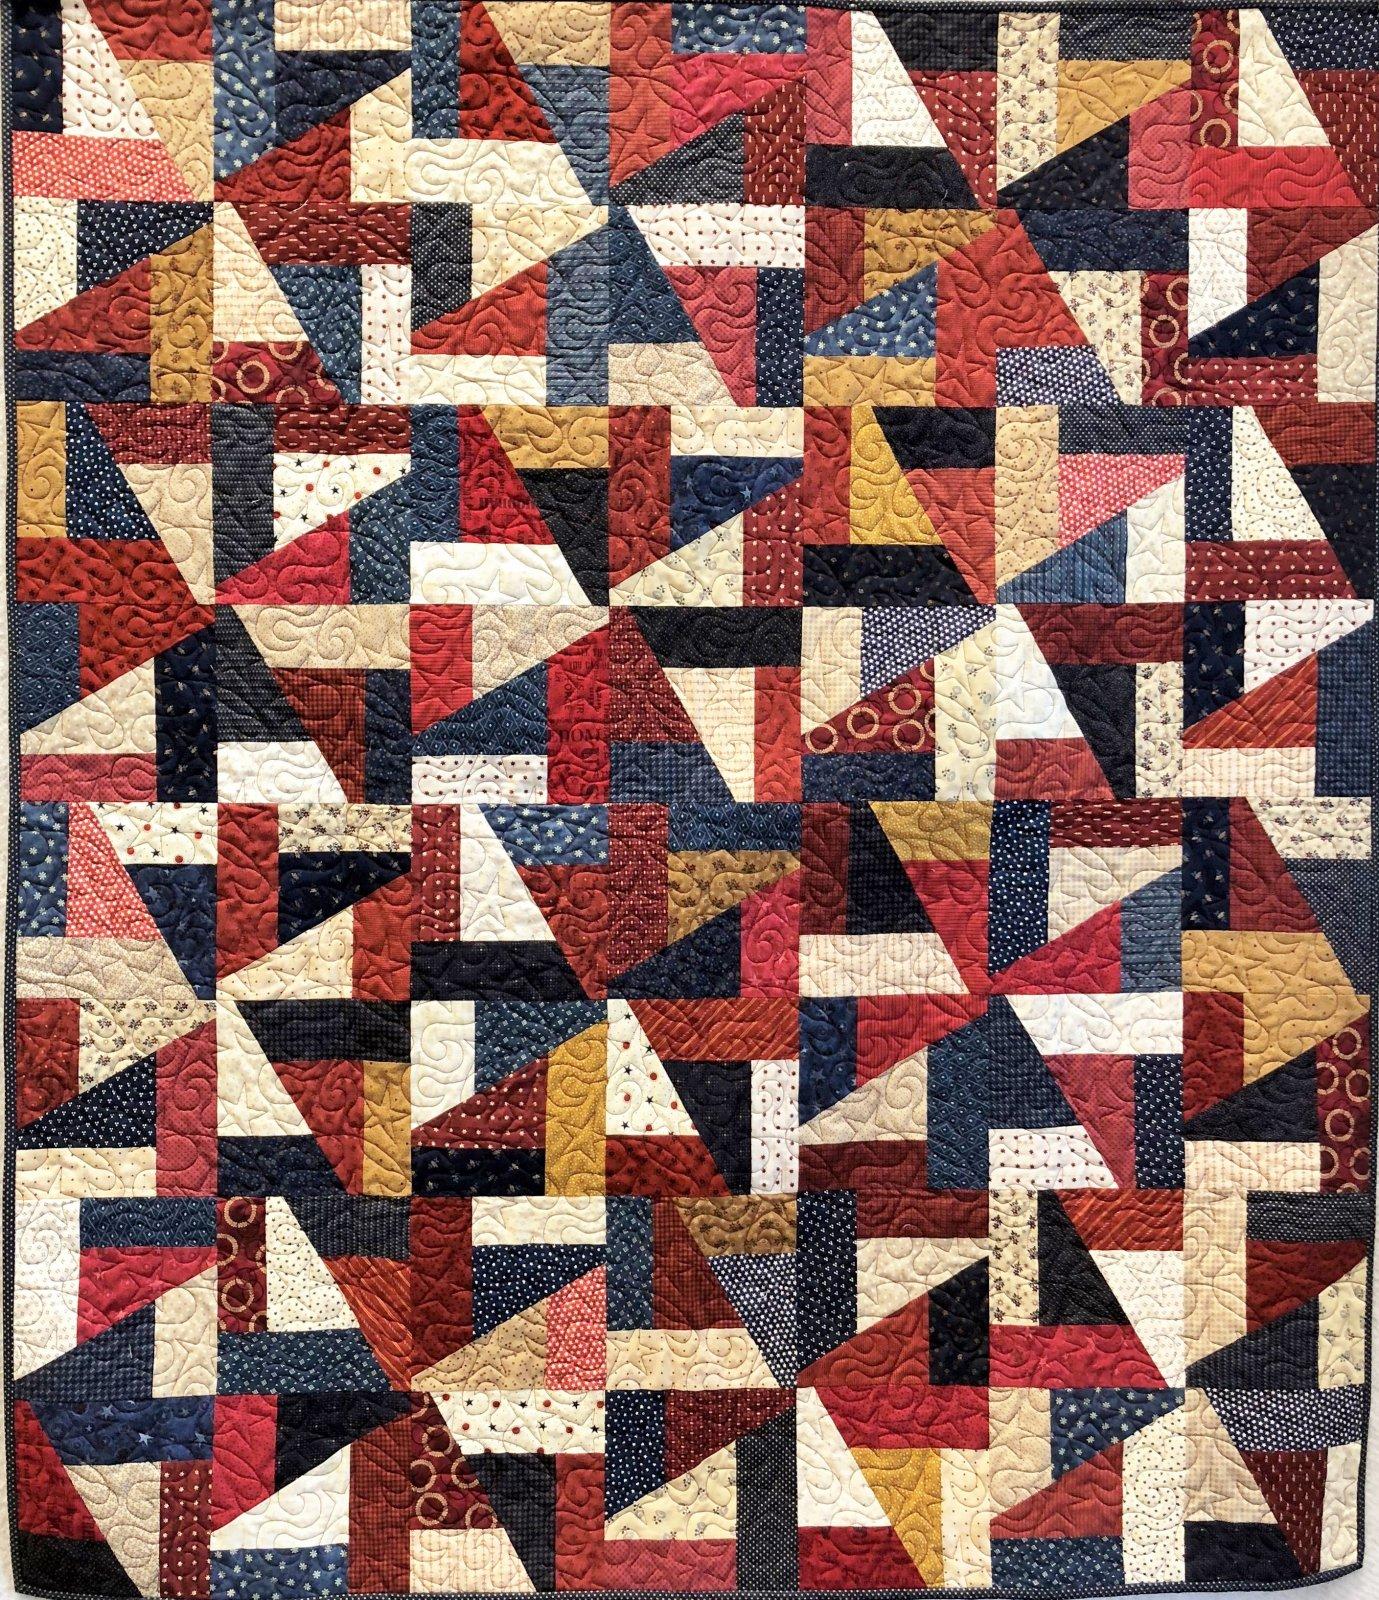 Patriotically Crazy - Quilt Kit - 56 x 64